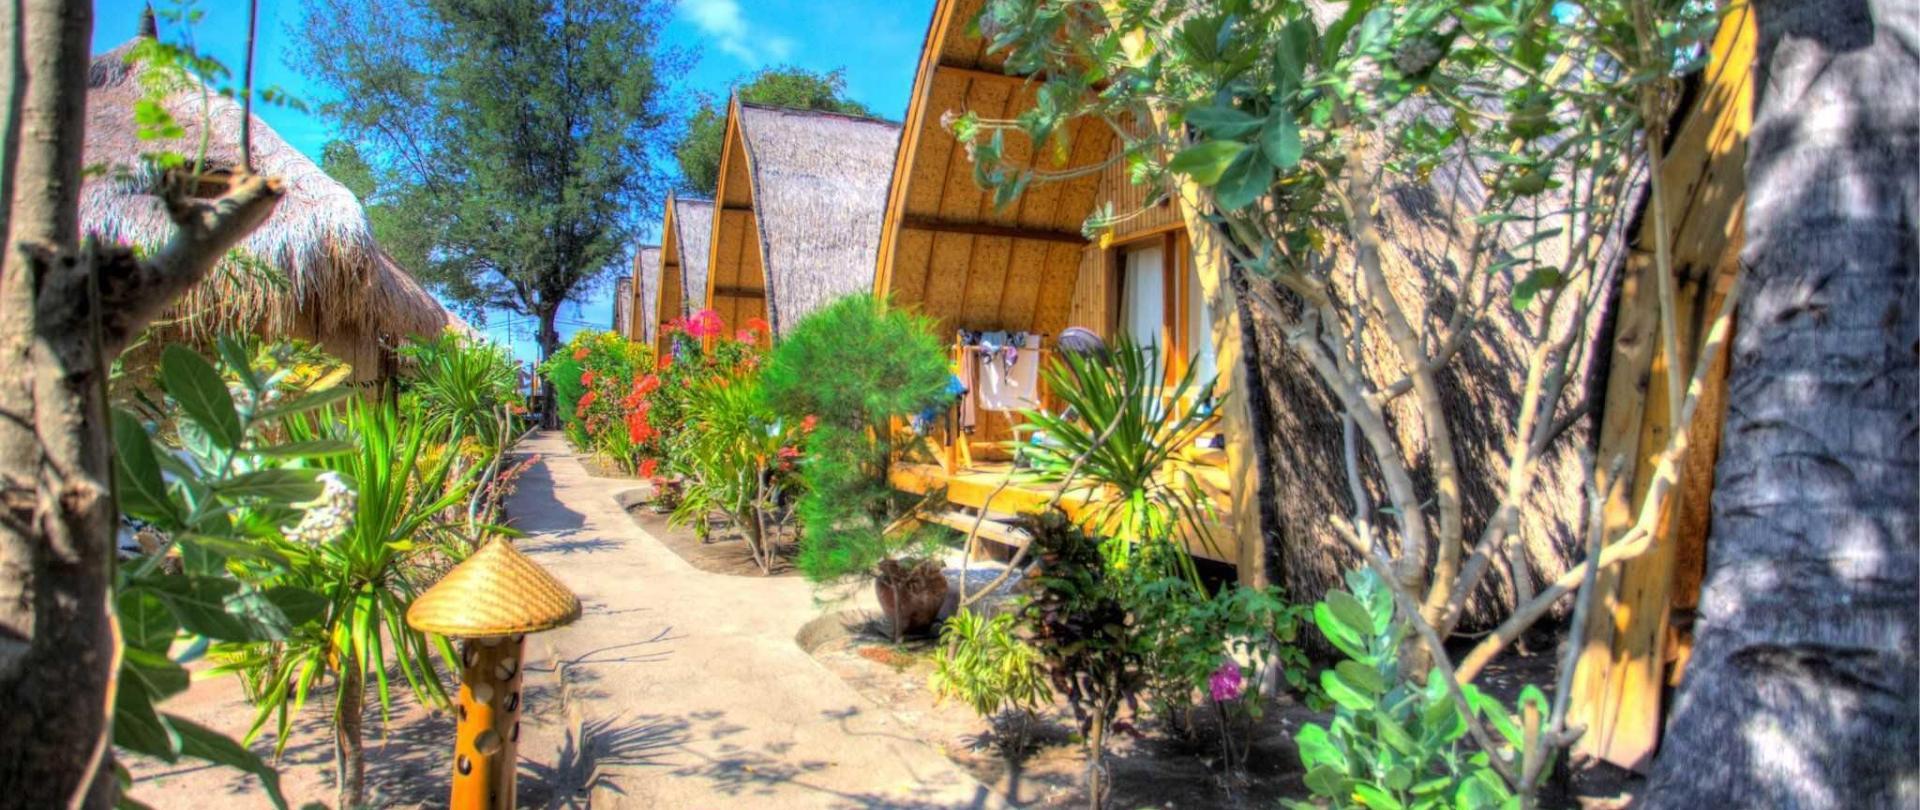 bambu-cottage-4-sur-13-1.jpg